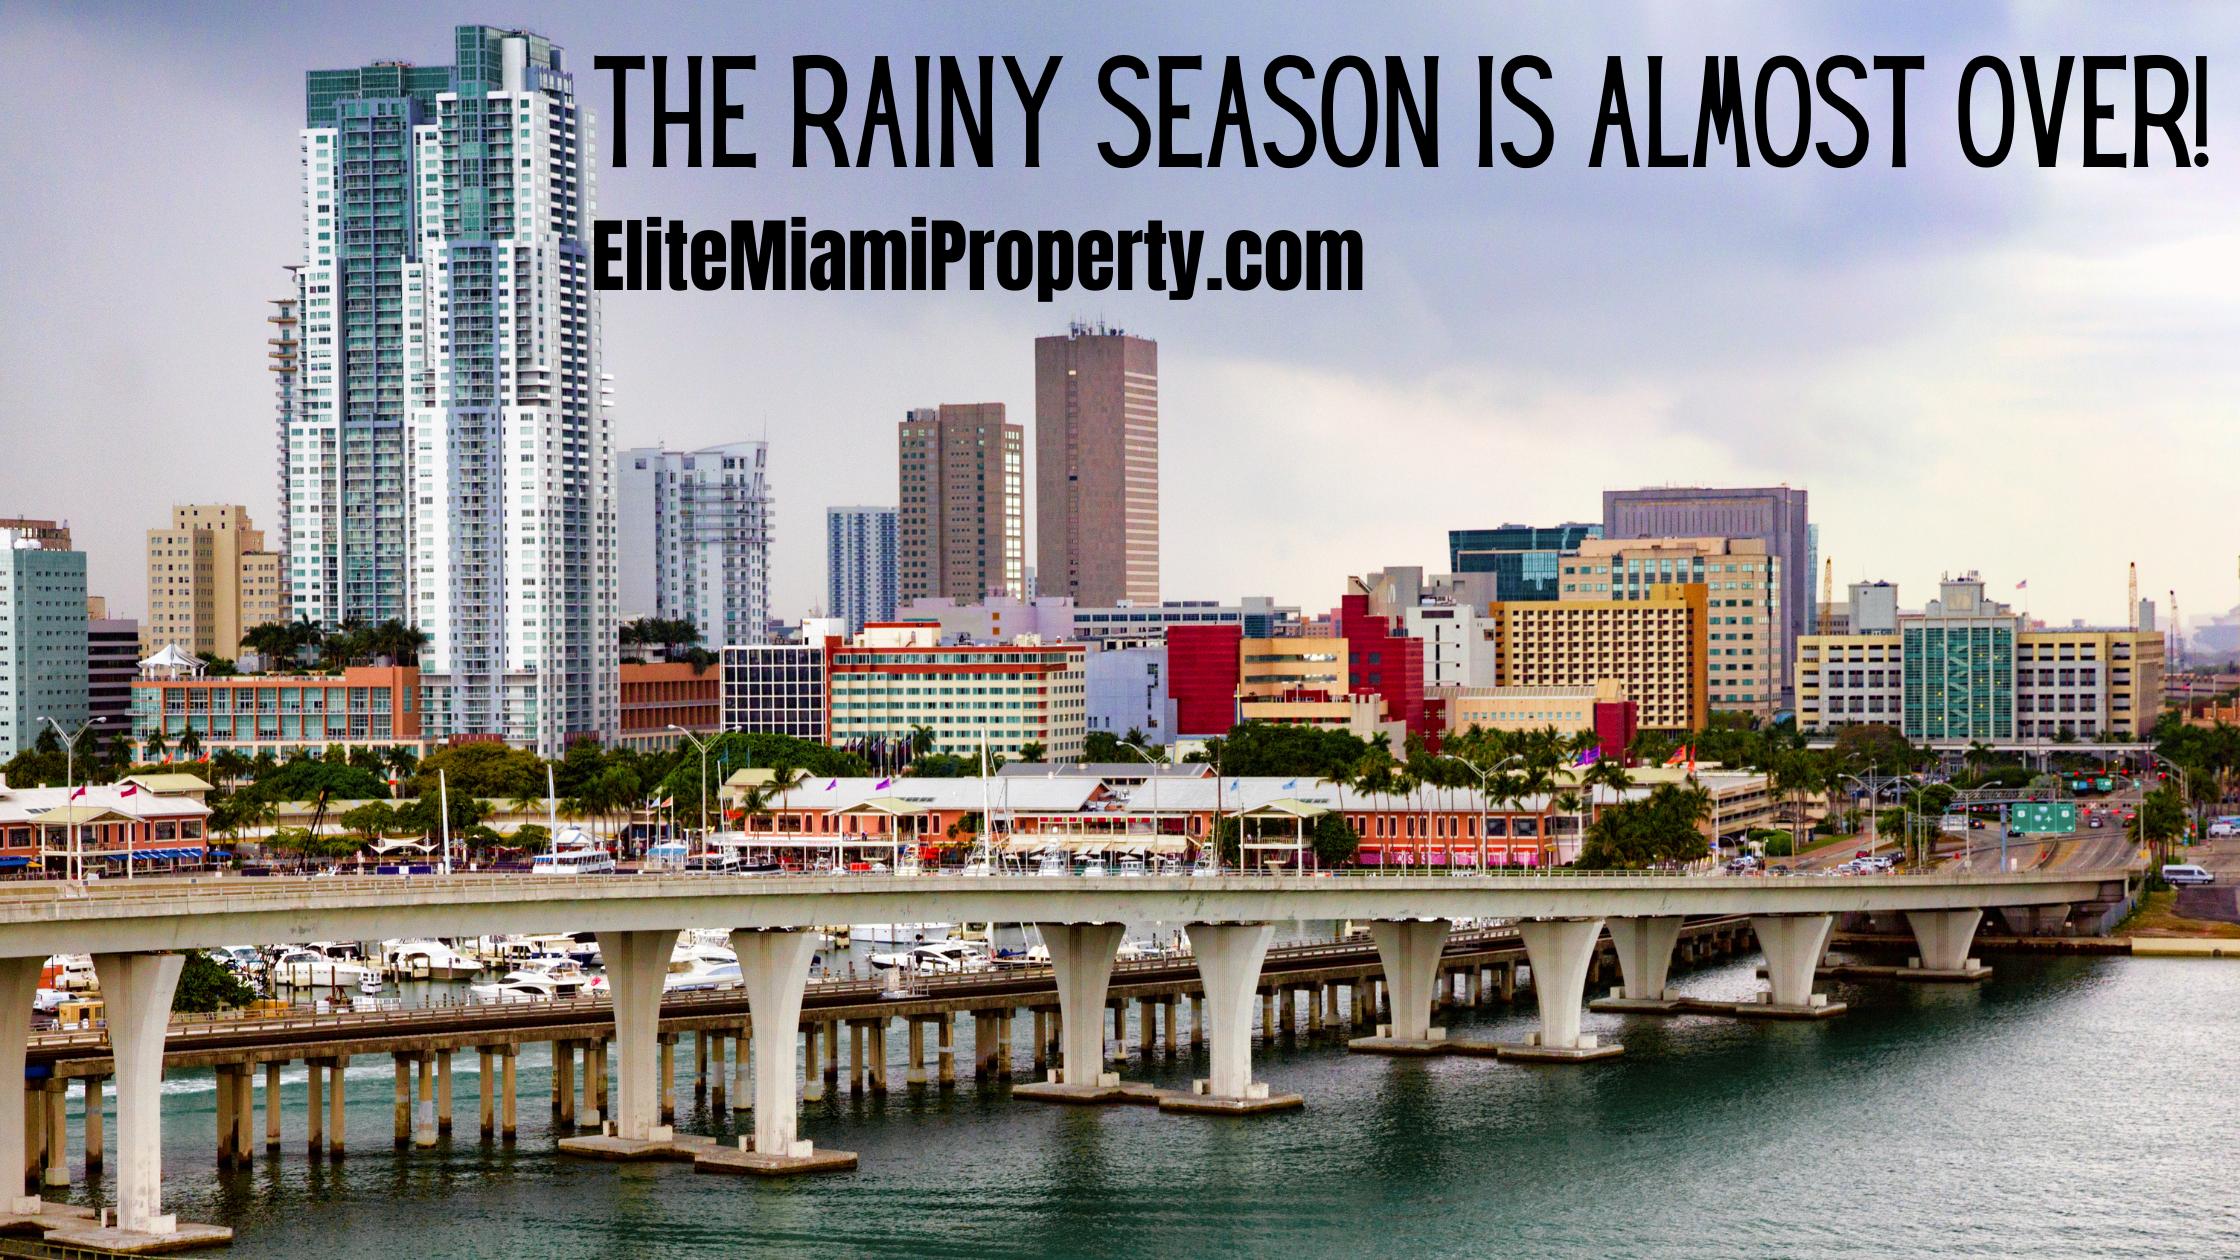 The Rainy Season is Almost Over in Miami!